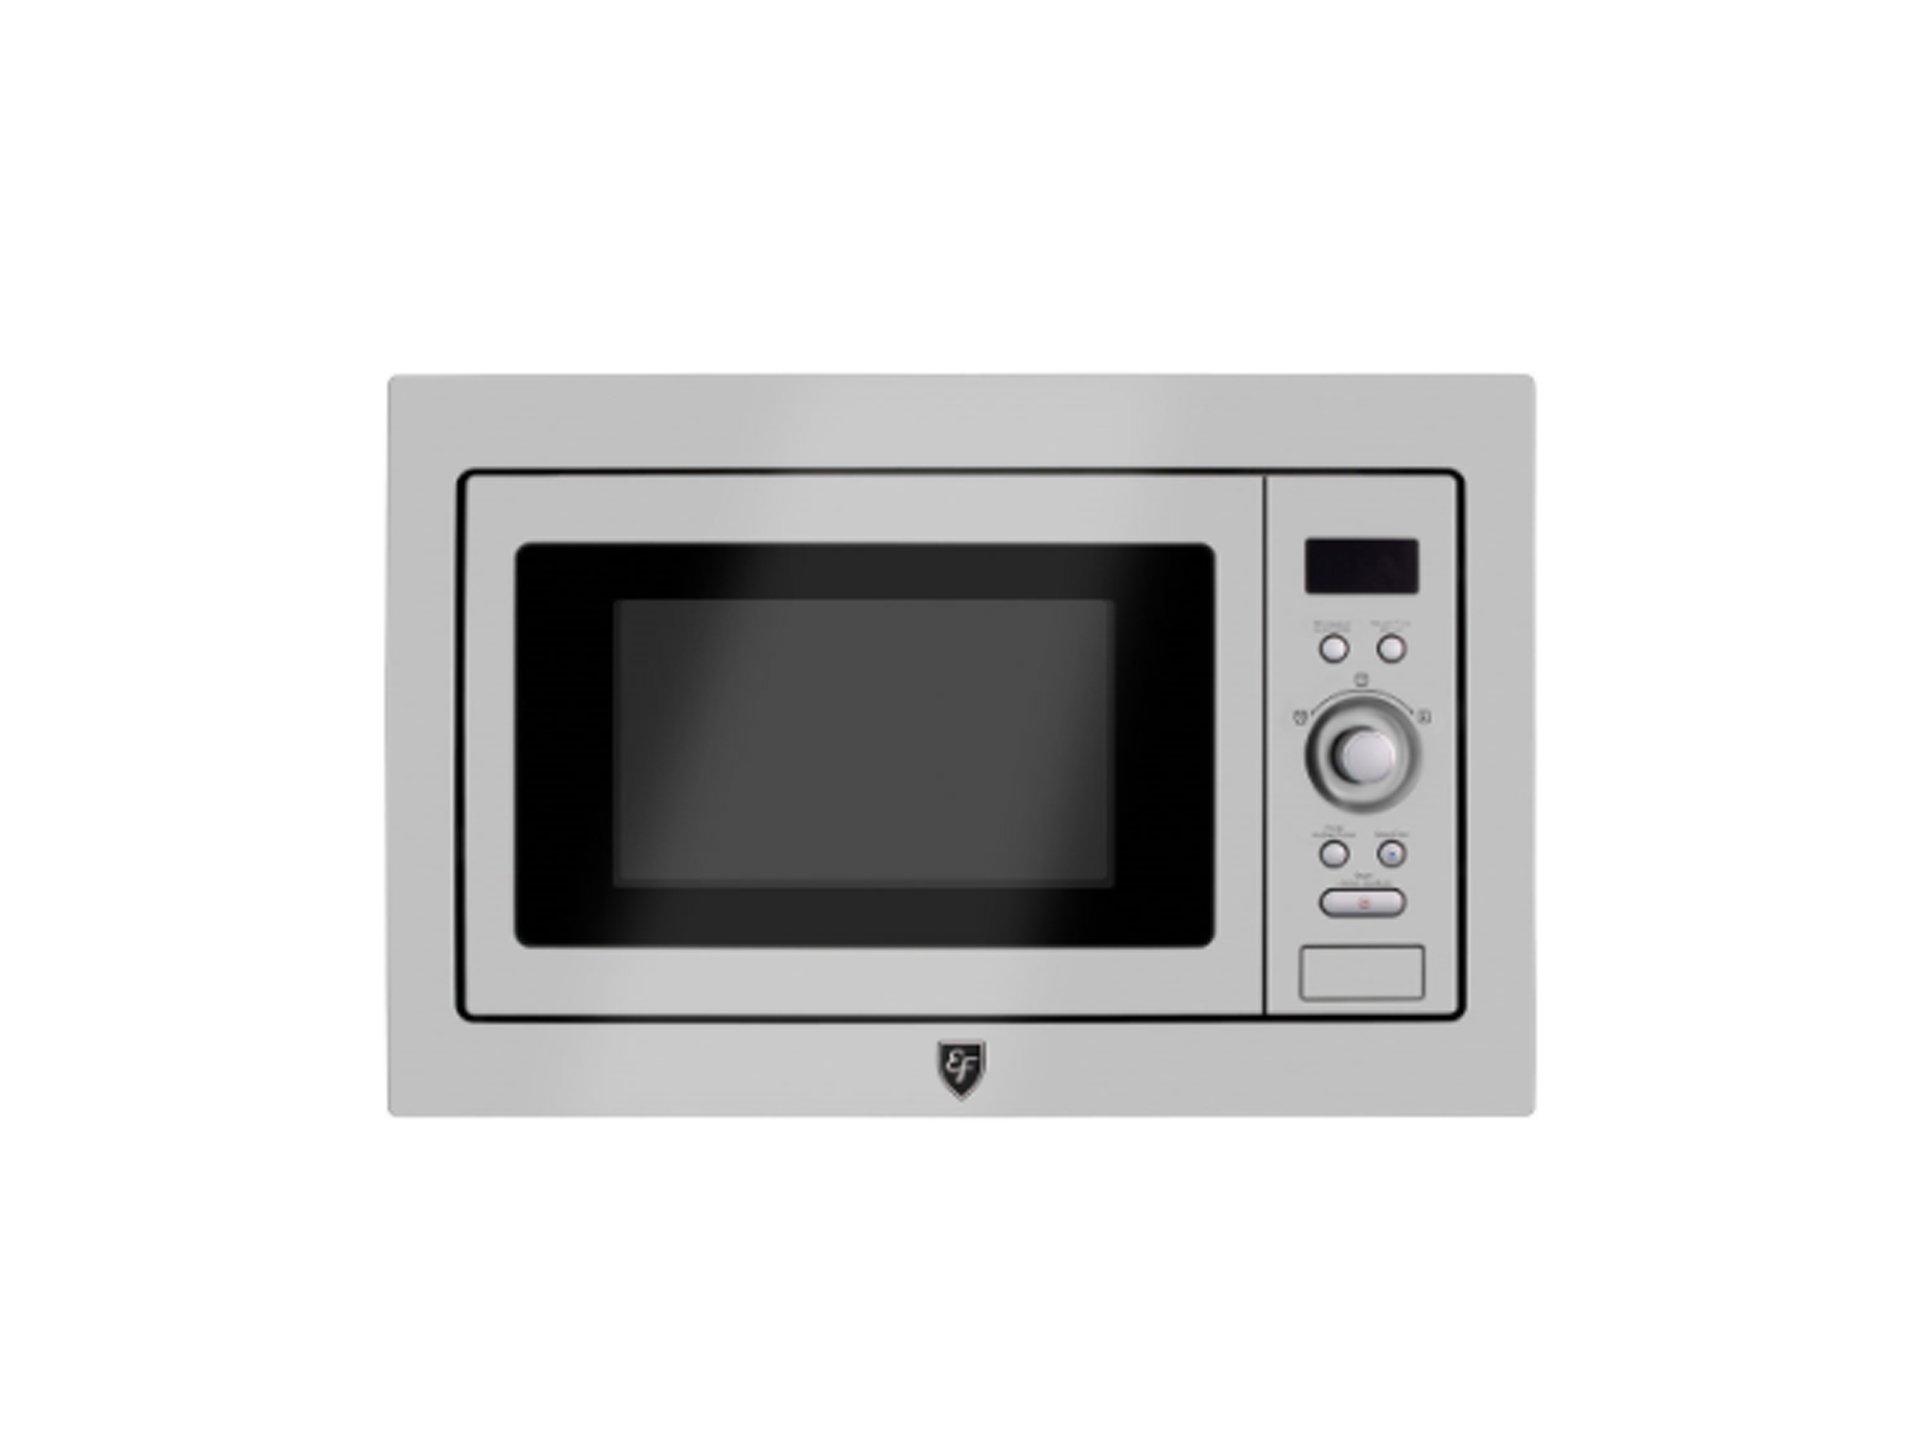 Yeobuild HomeStore EF BM 259 M Microwave Oven